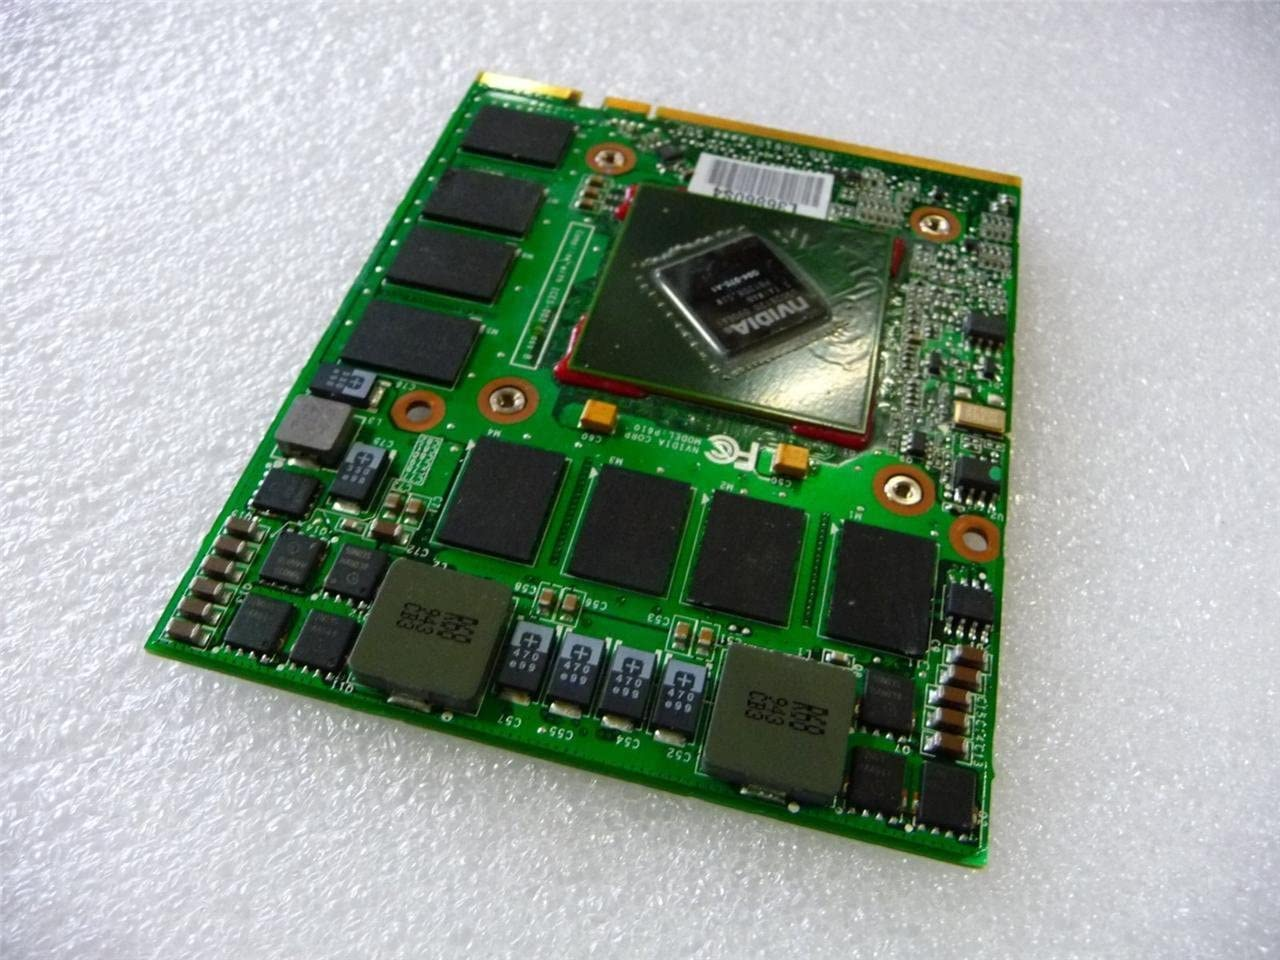 NVIDIA QUADRO FX2700M 512MB G94-975-A1 VIDEO GRAPHICS CARD